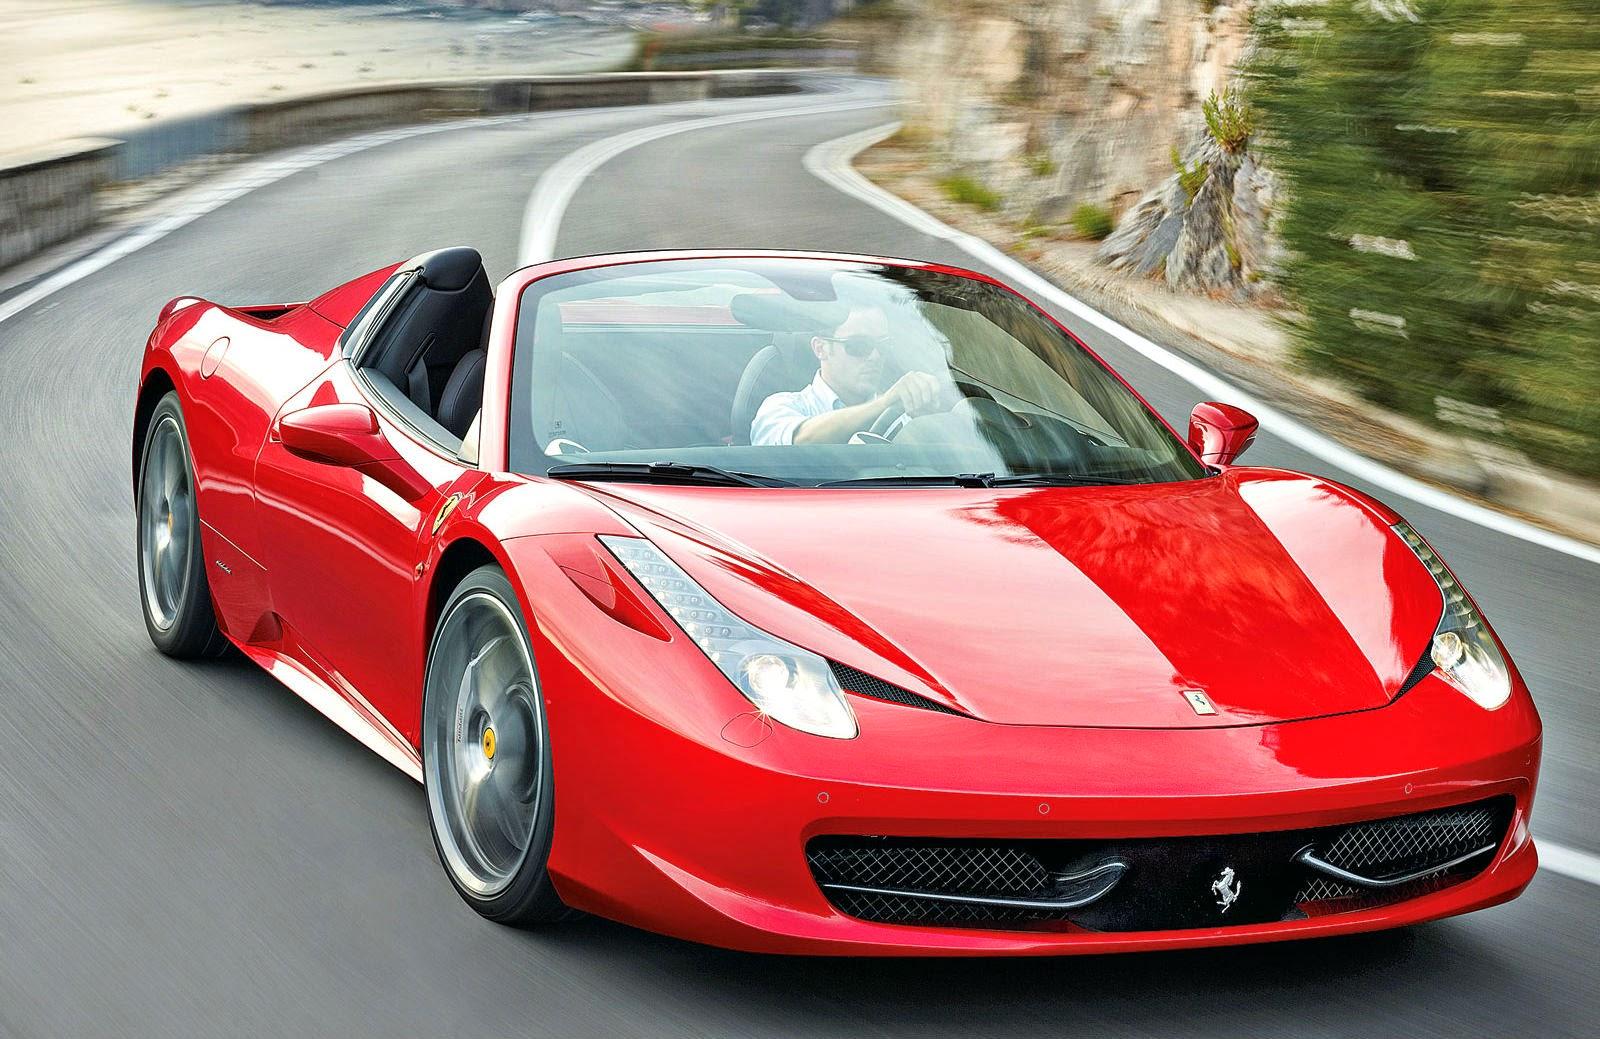 Ferrari 458 Spider Hire Luxury Cars Hire London Uk